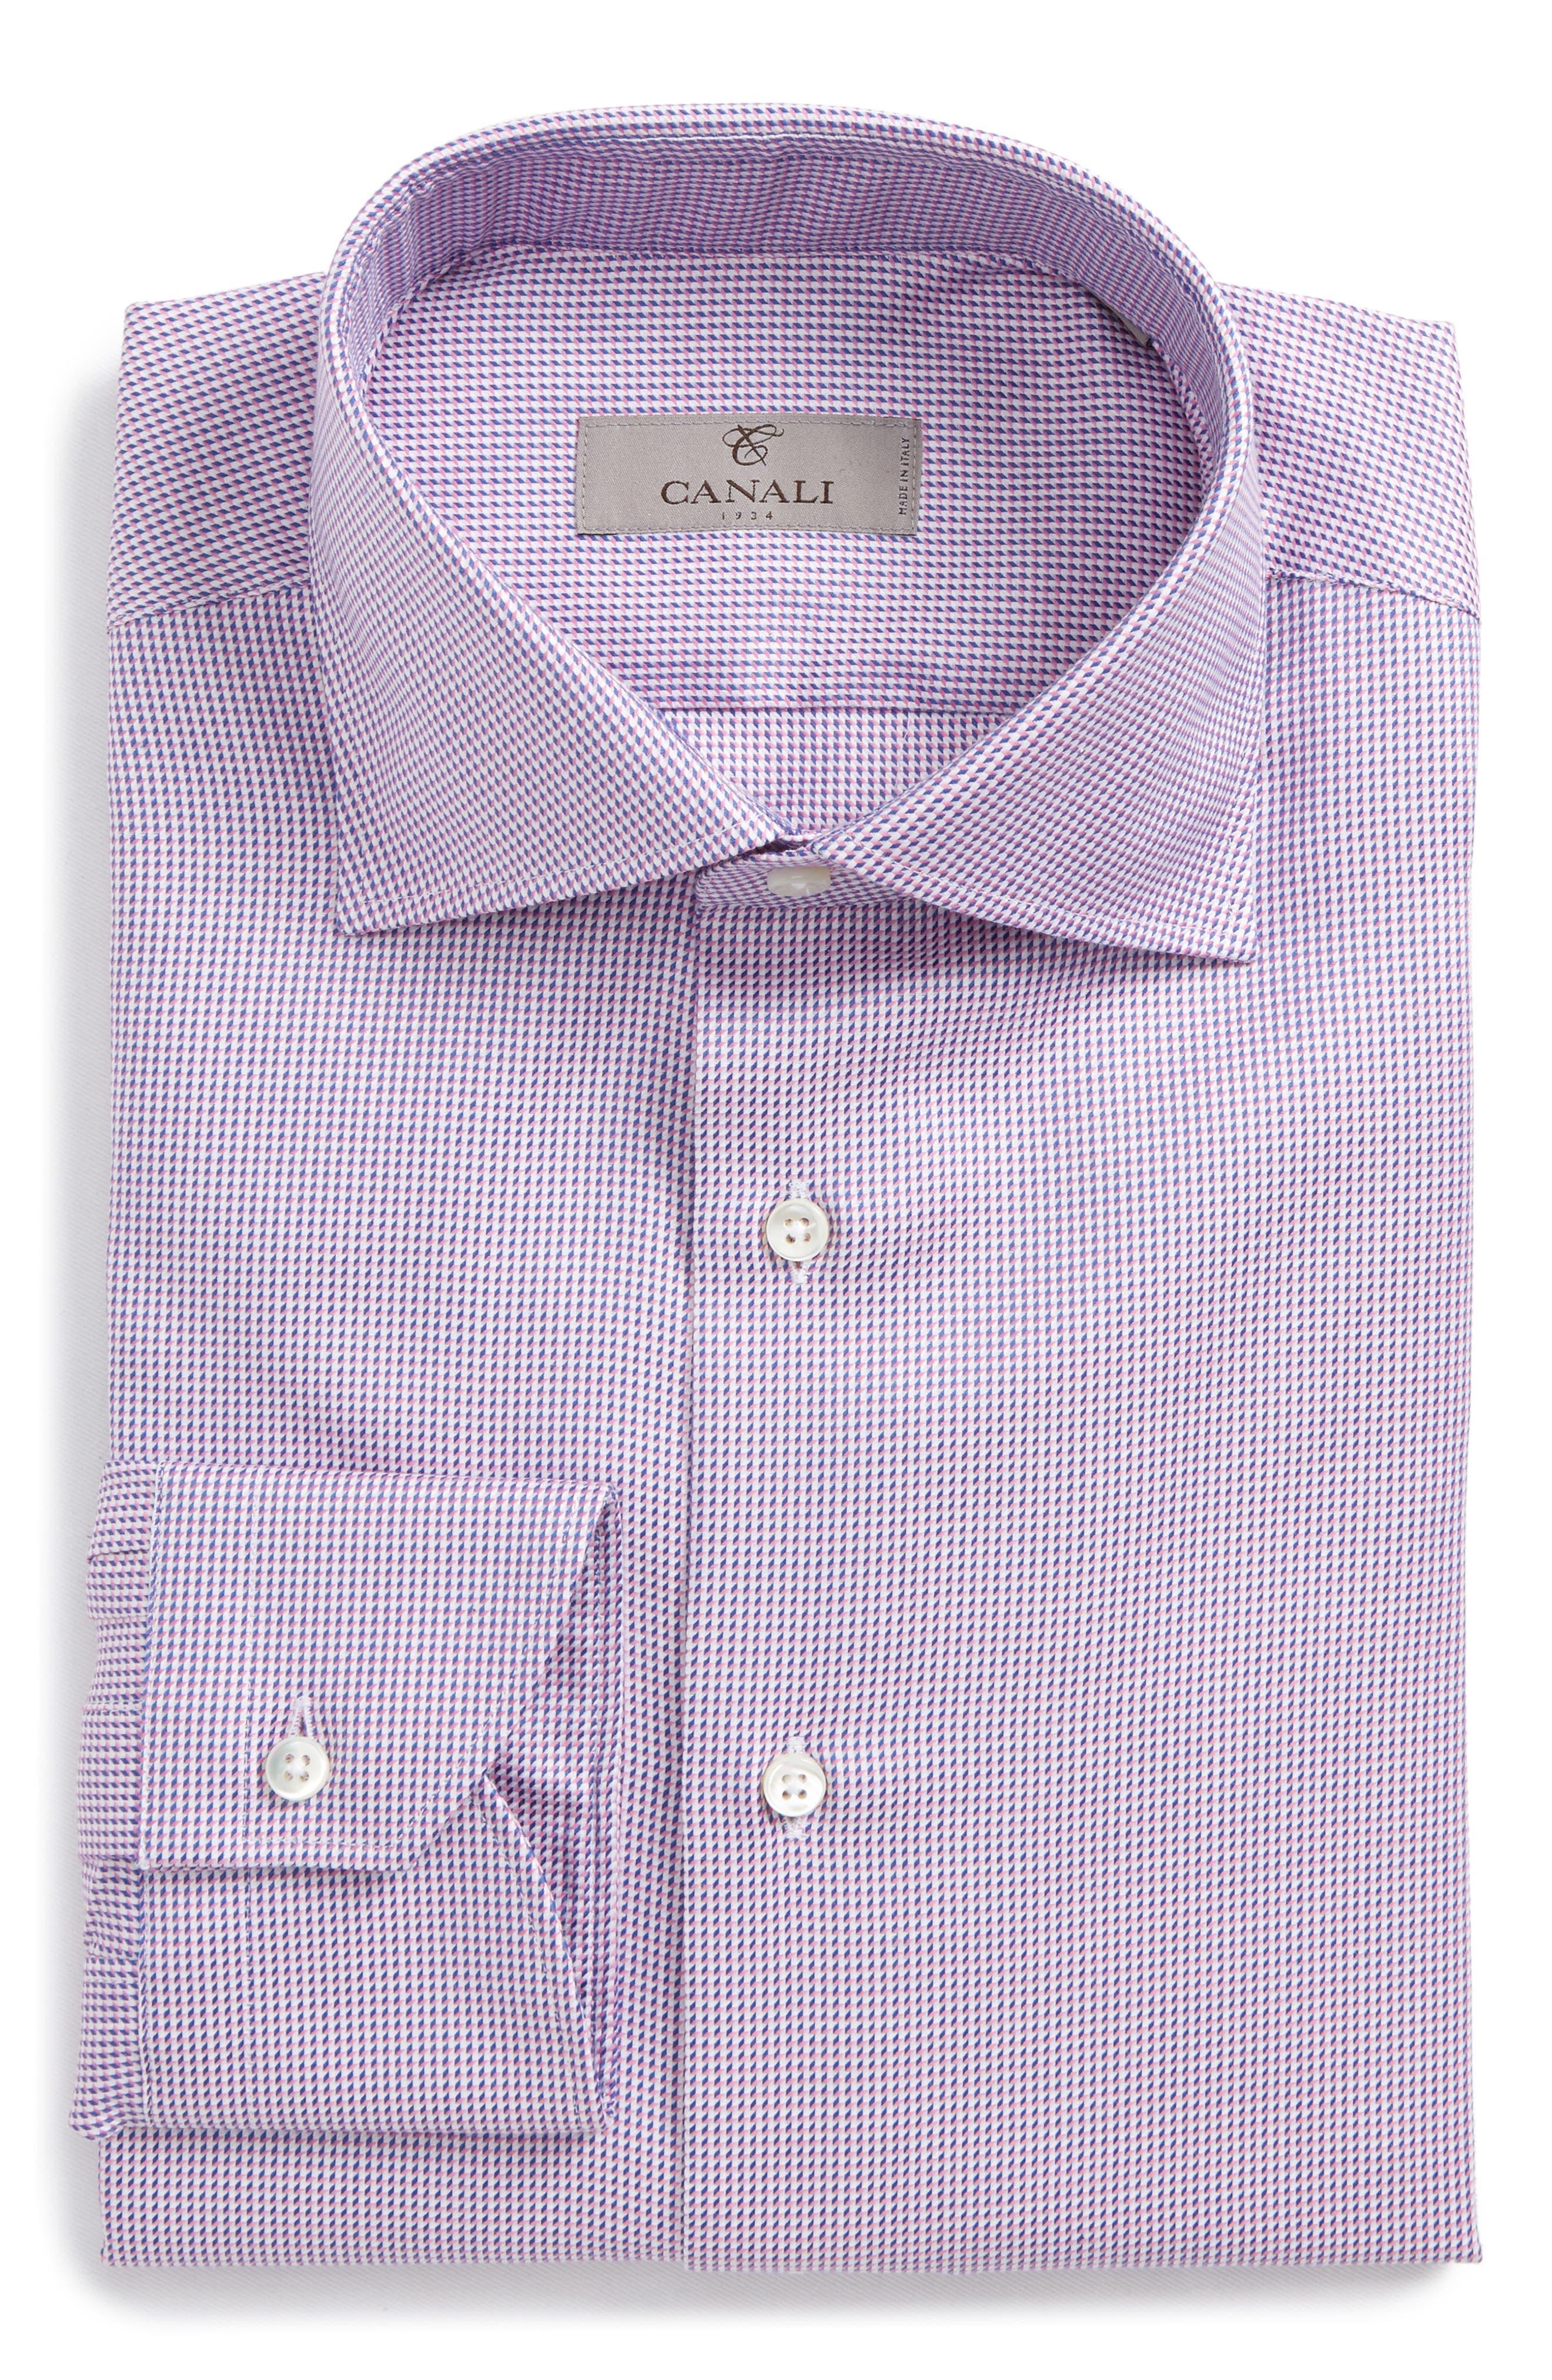 Regular Fit Houndstooth Dress Shirt,                         Main,                         color, 650